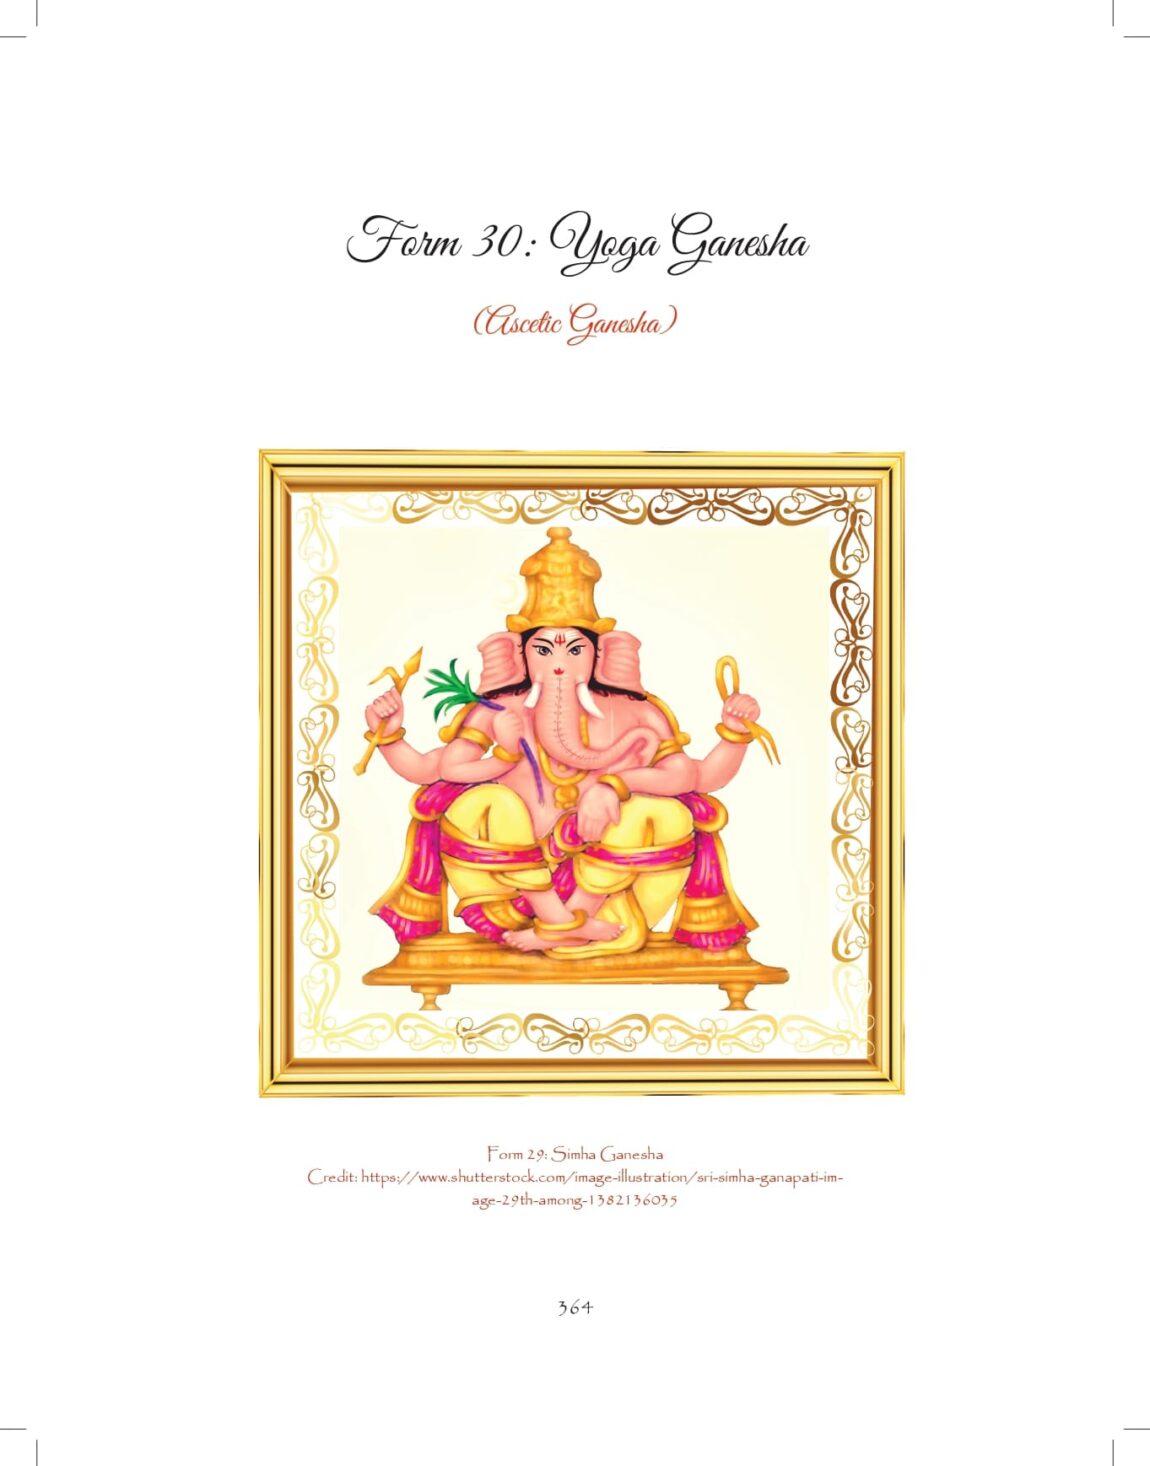 Ganesh-print_pages-to-jpg-0364.jpg